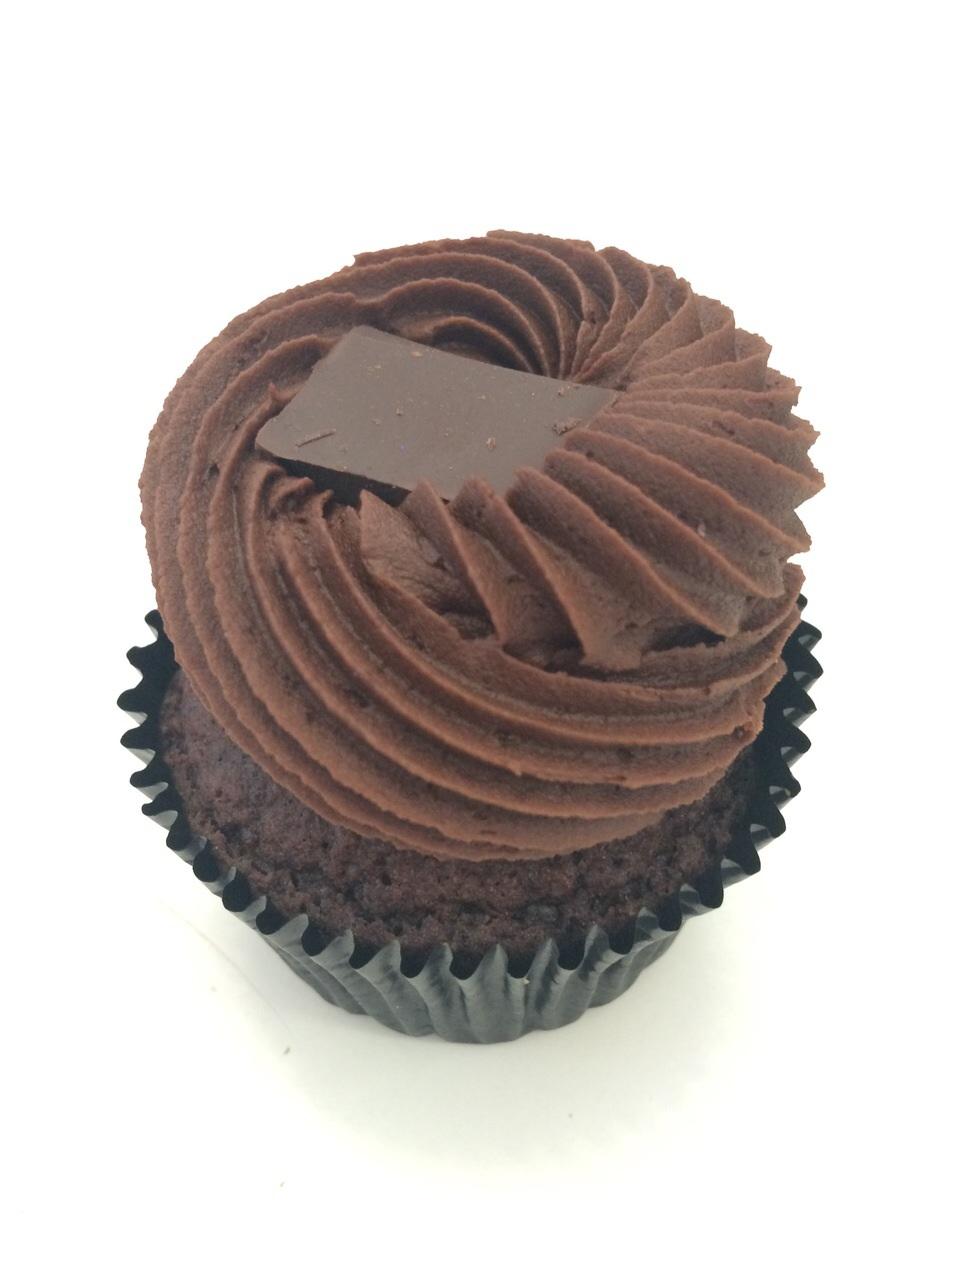 https://i0.wp.com/fatgayvegan.com/wp-content/uploads/2015/04/Chocolate-Exposion.jpg?fit=960%2C1280&ssl=1